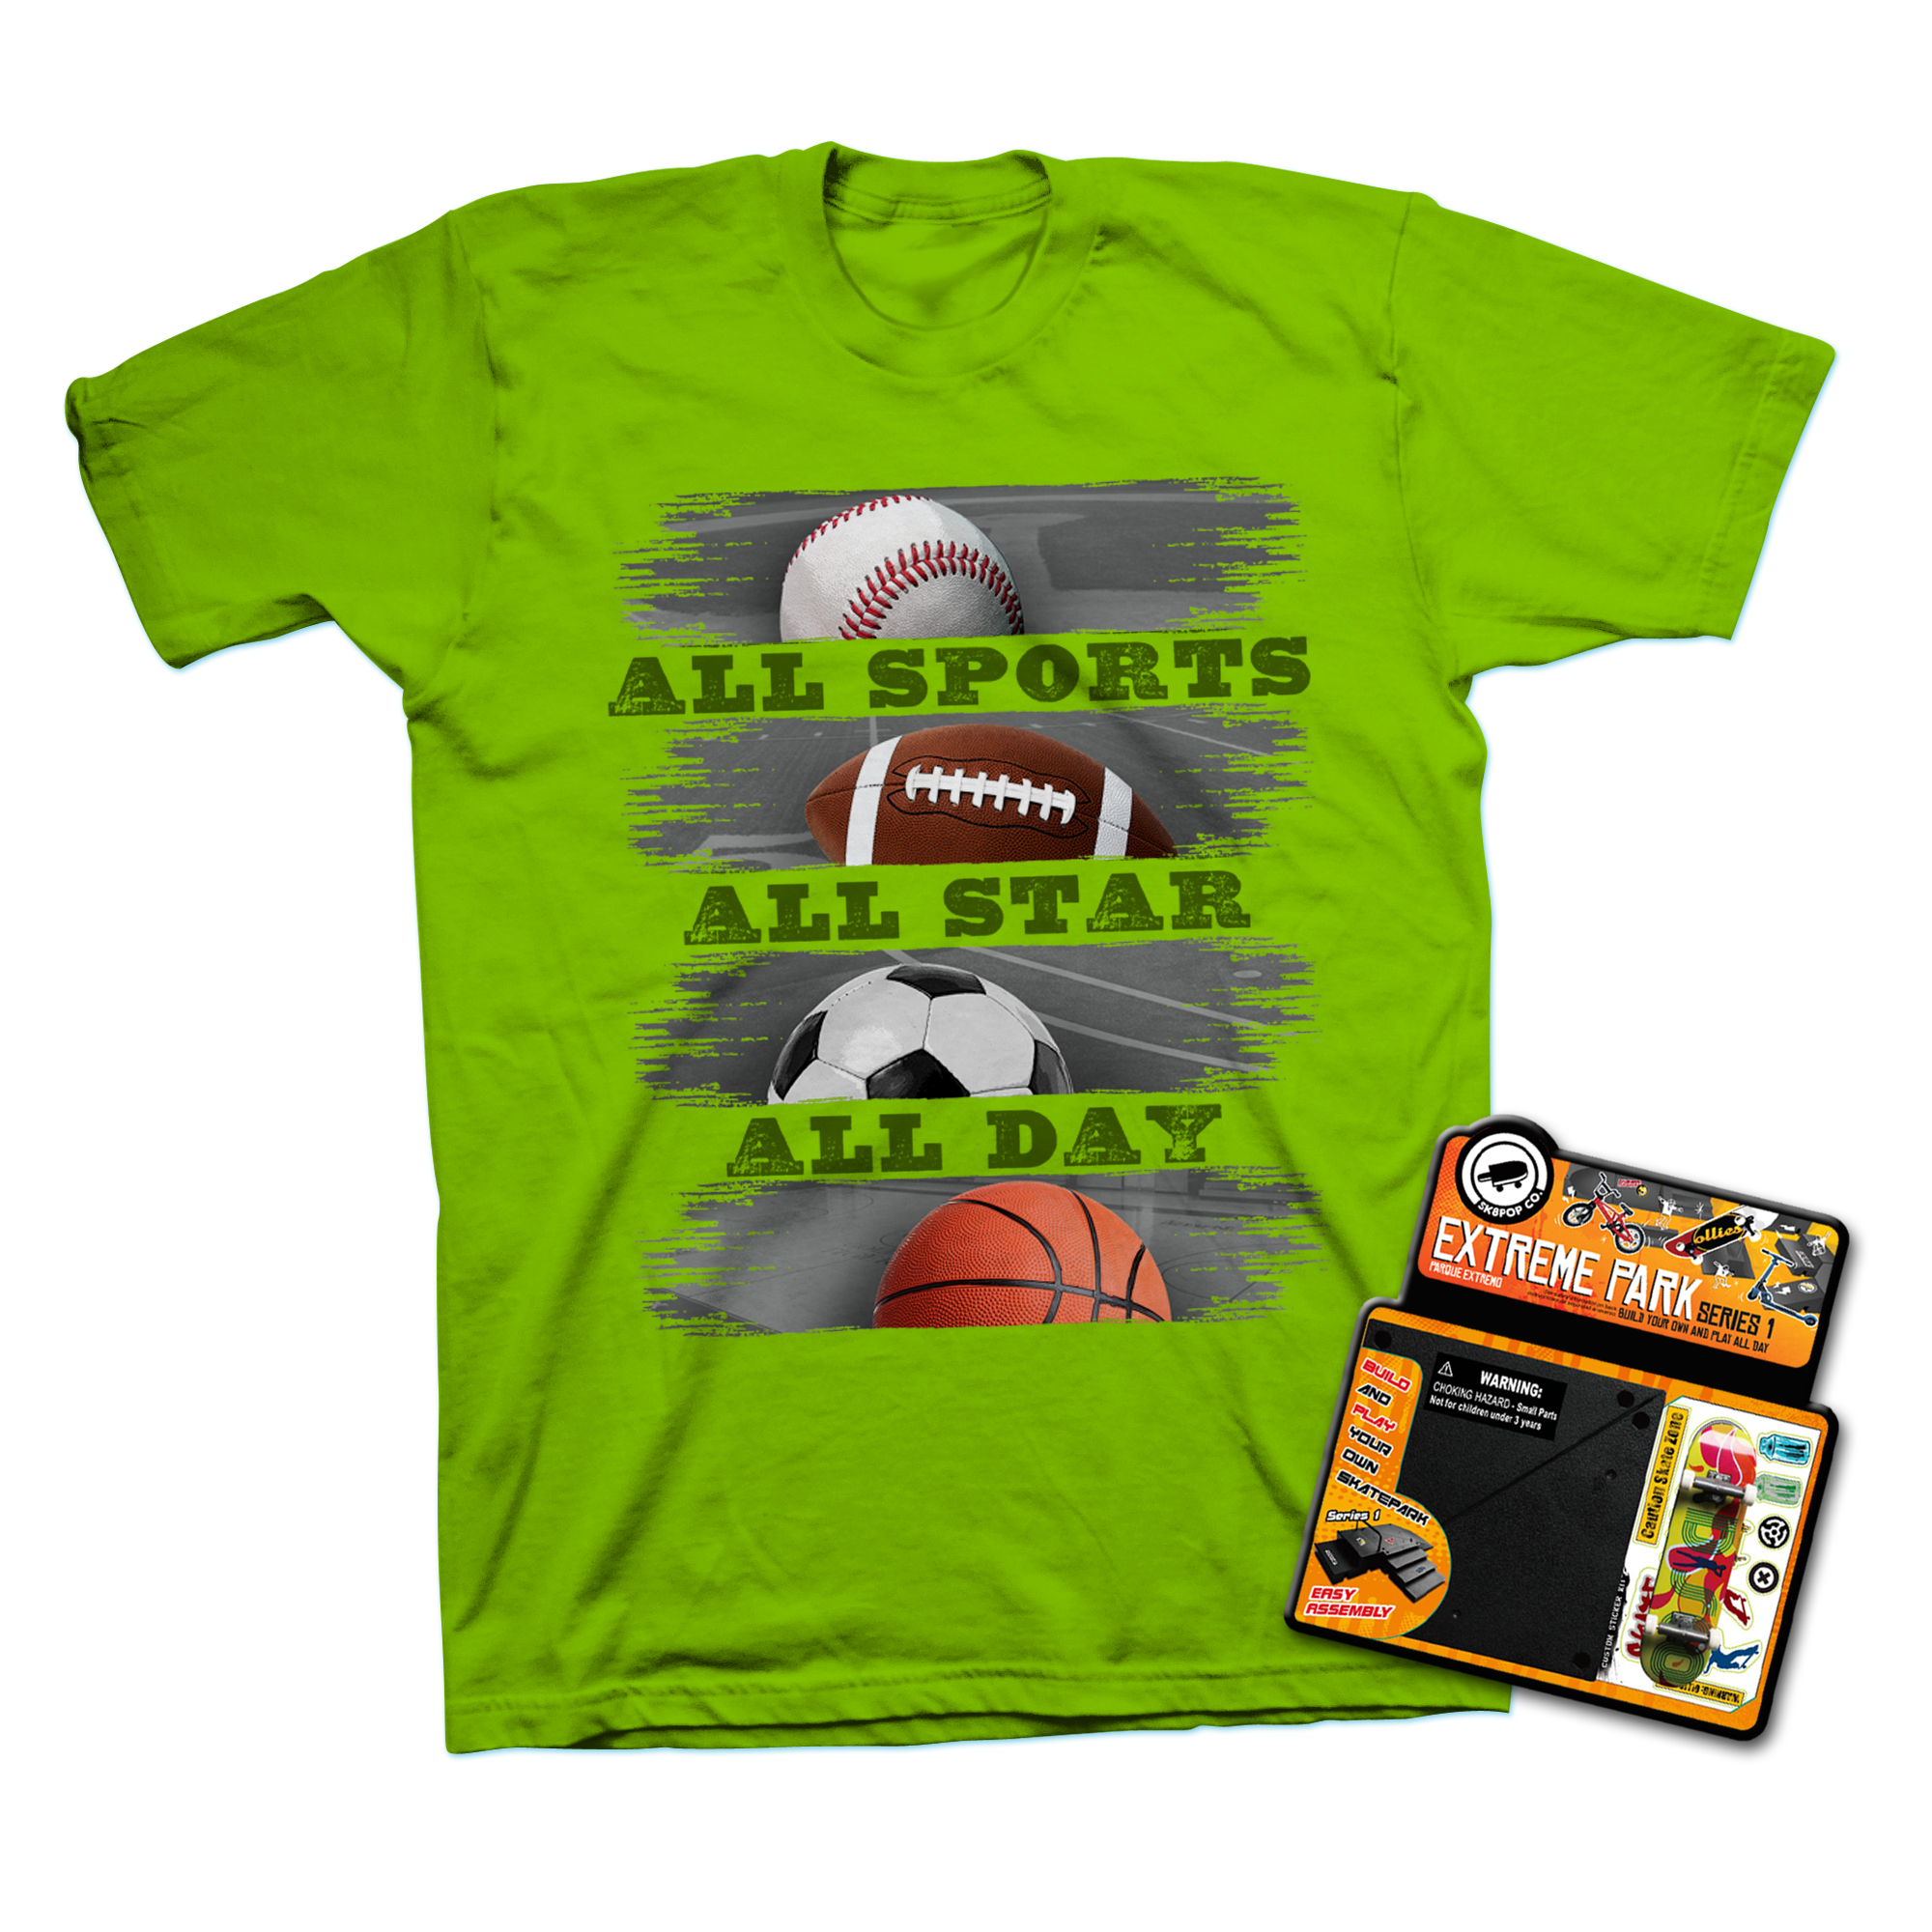 Rudeboyz Boy's Graphic T-Shirt & Toy - Sports